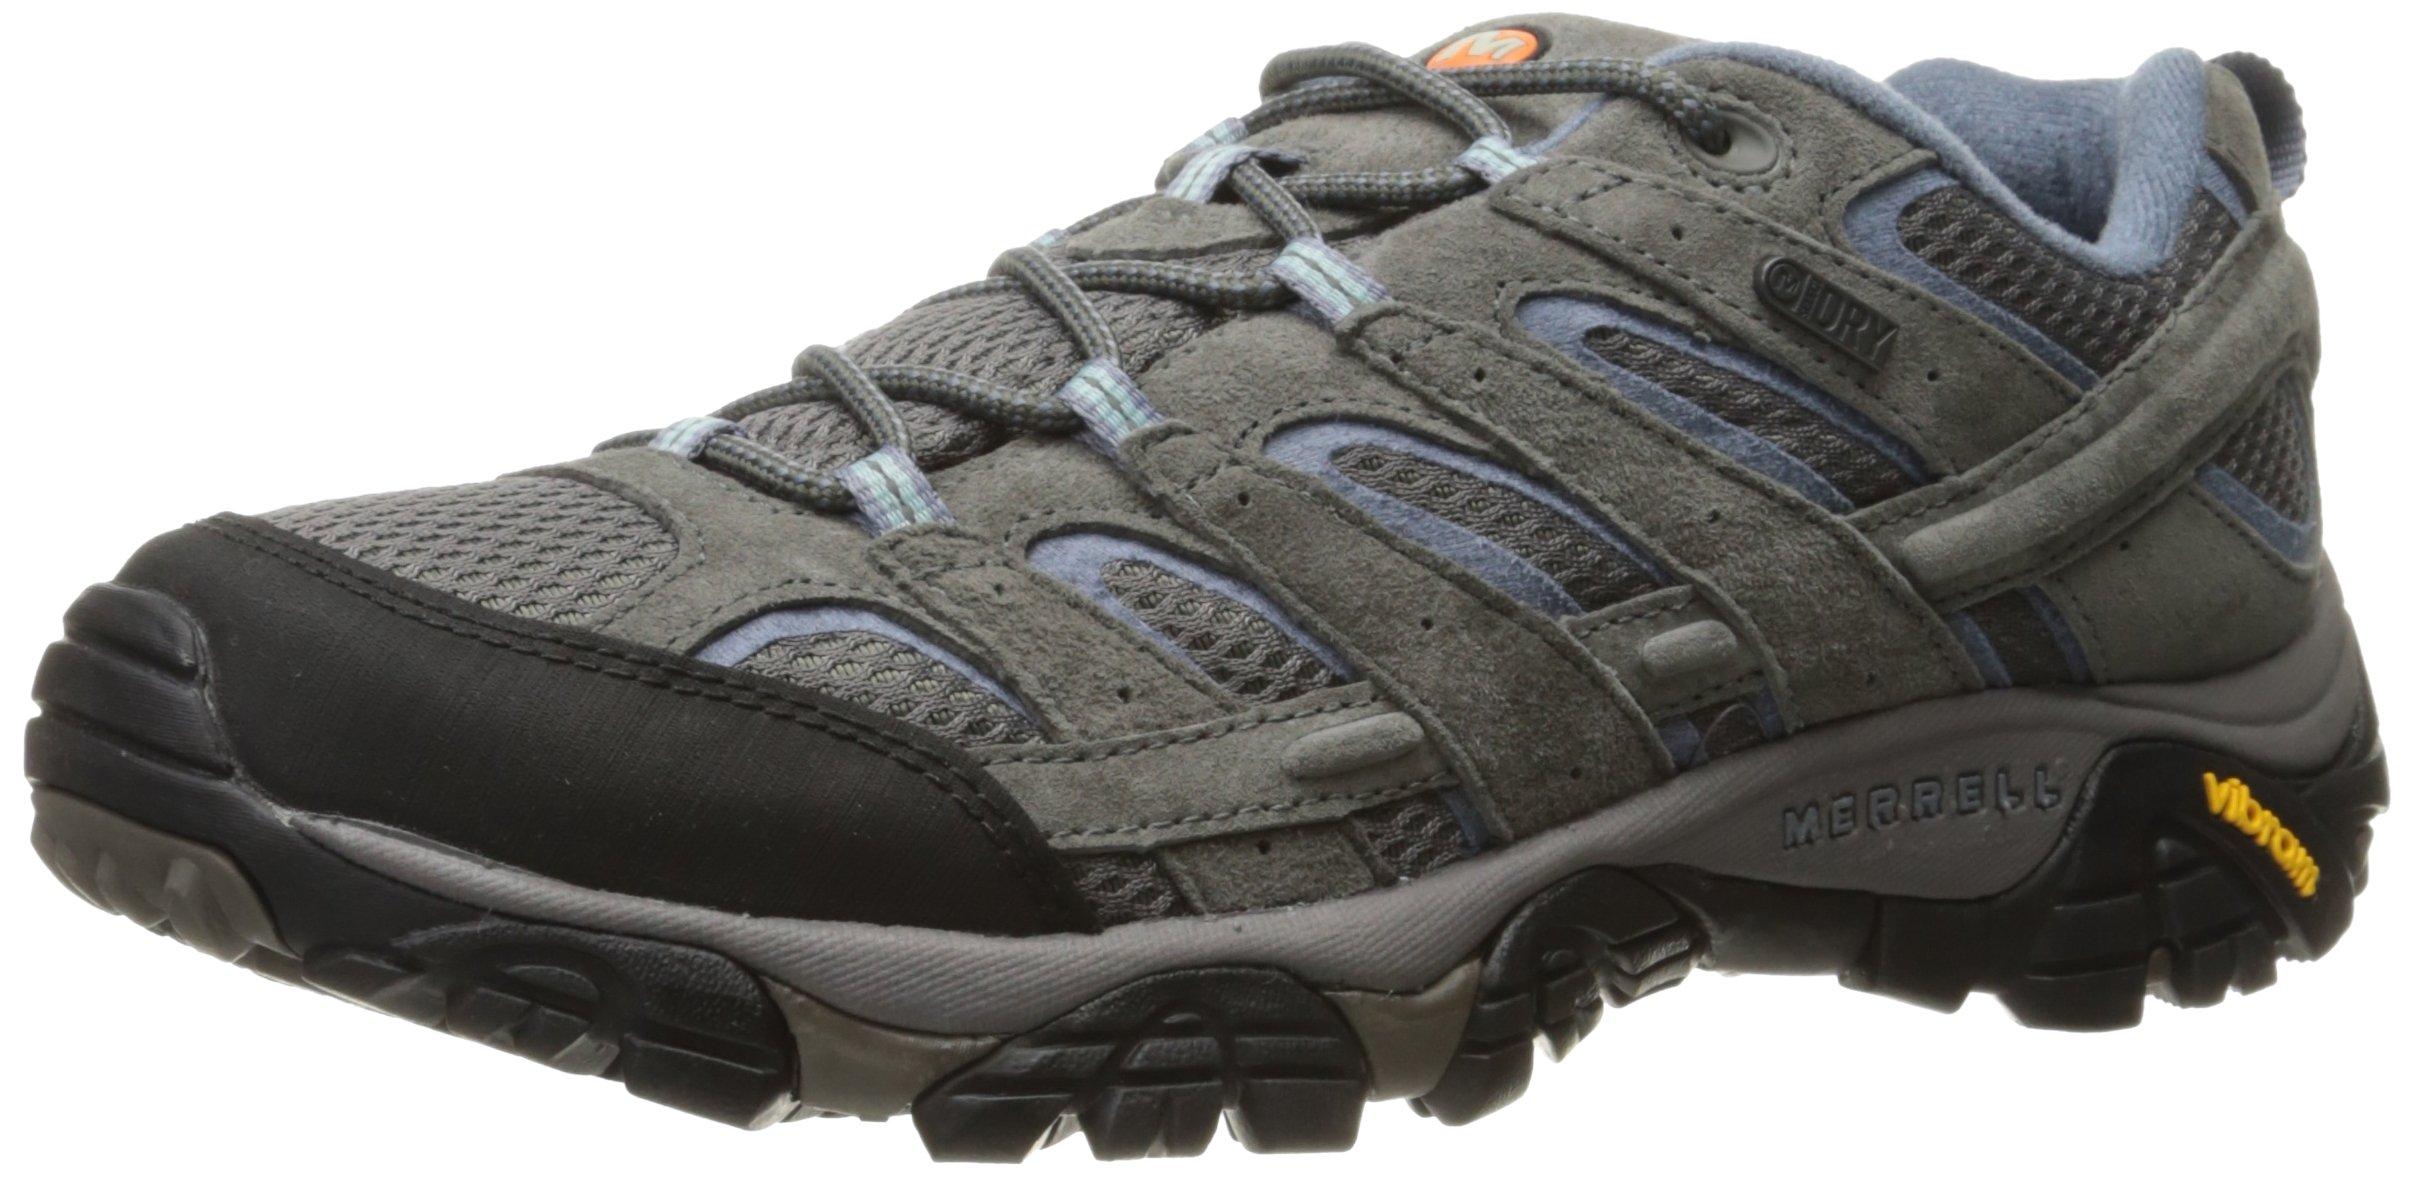 Merrell Women's Moab 2 Waterproof Hiking Shoe, Granite, 7.5 M US